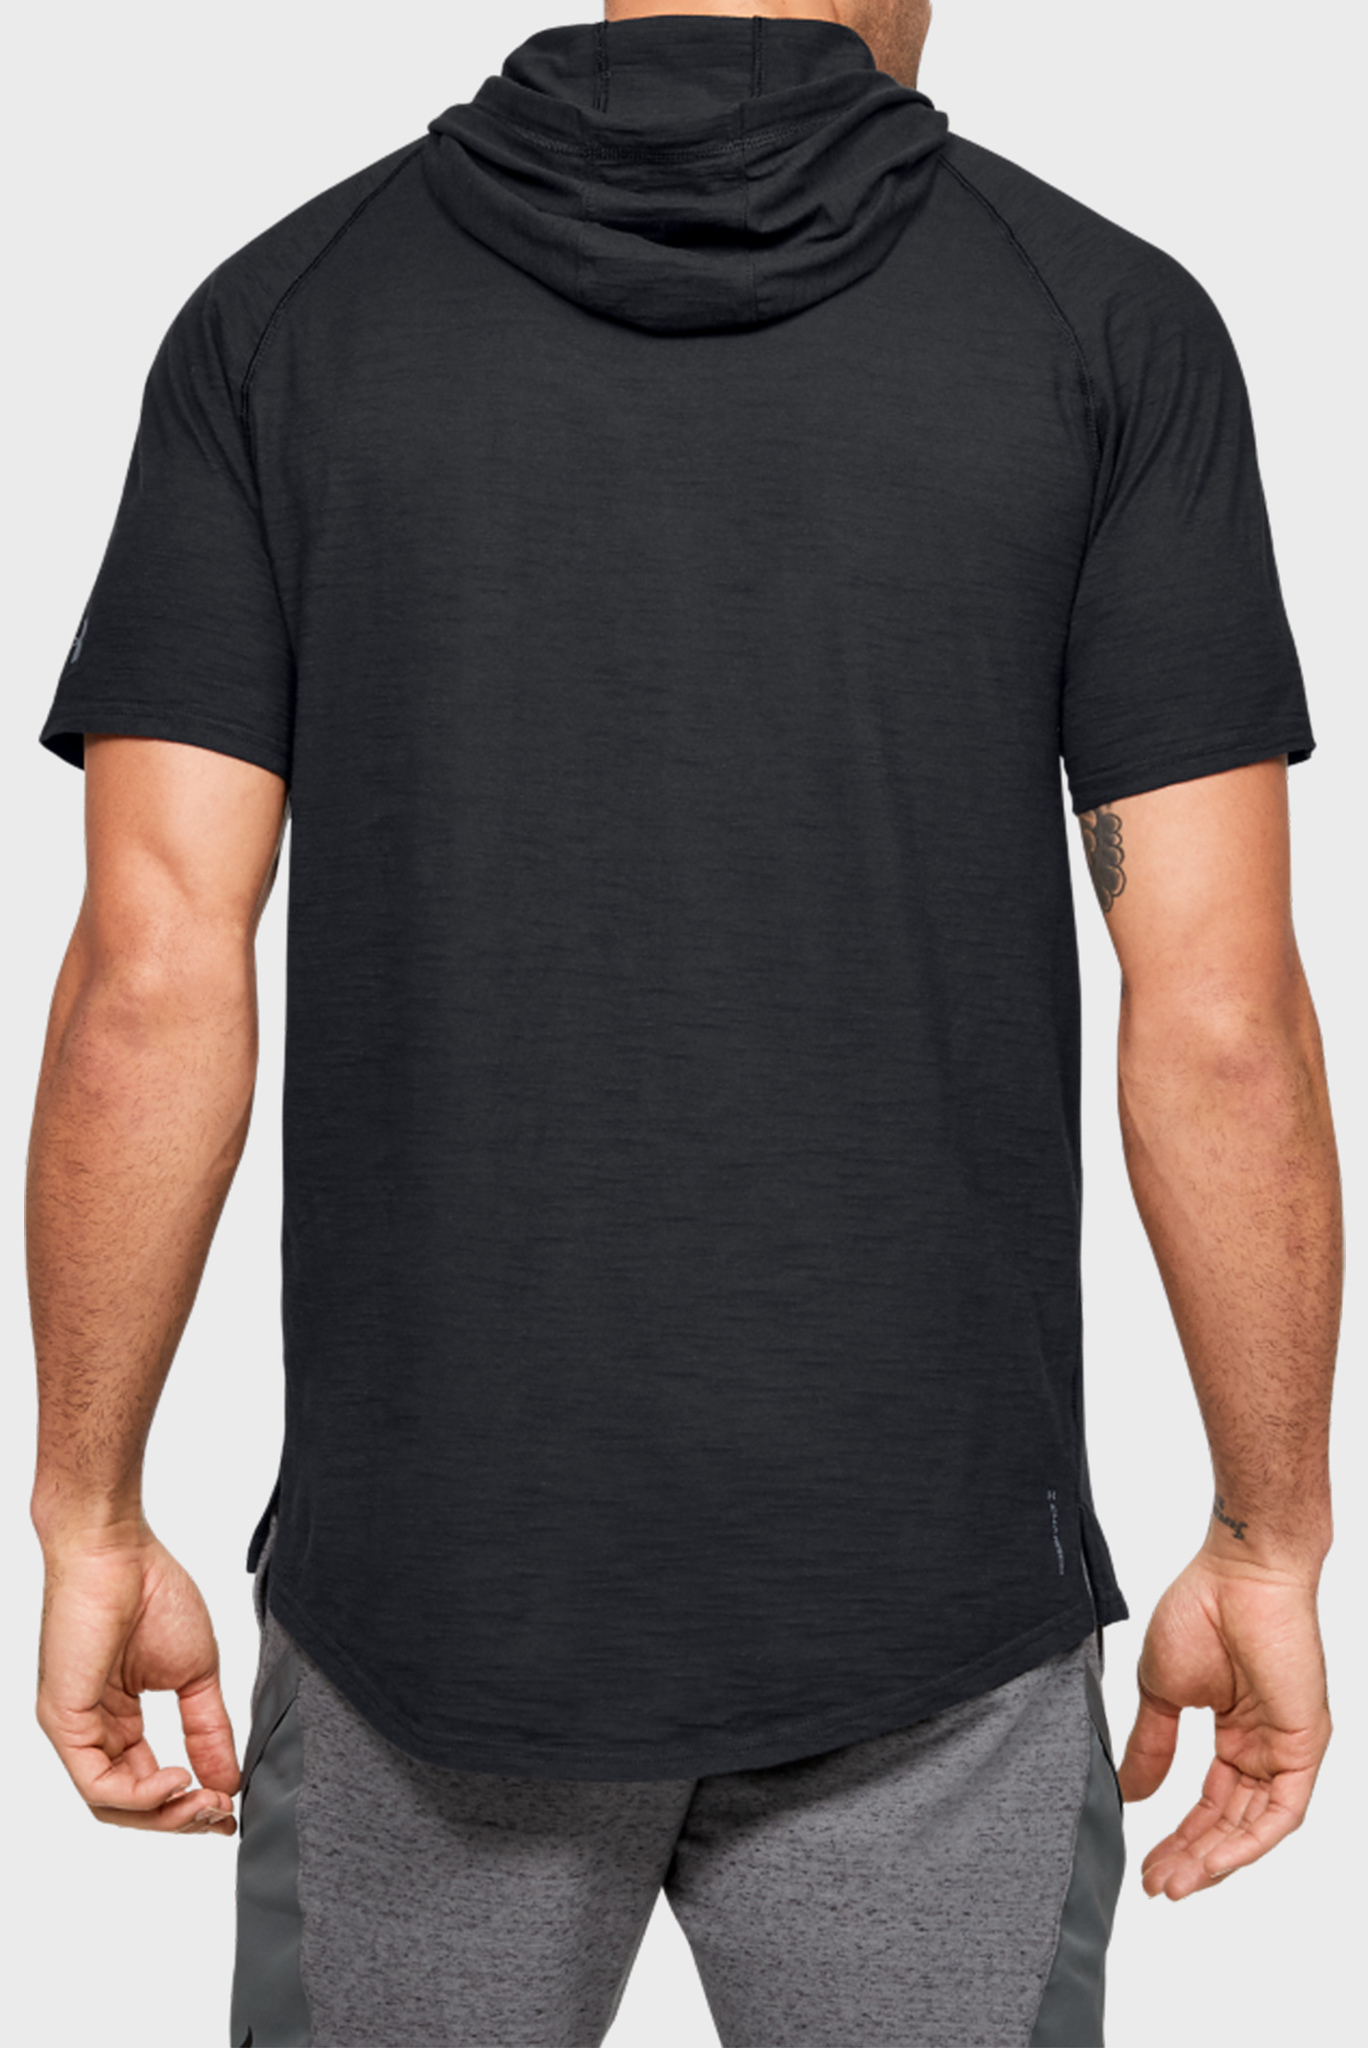 Мужская спортивная футболка-худи Project Rock Charged Cotton SS Hoodie Under Armour